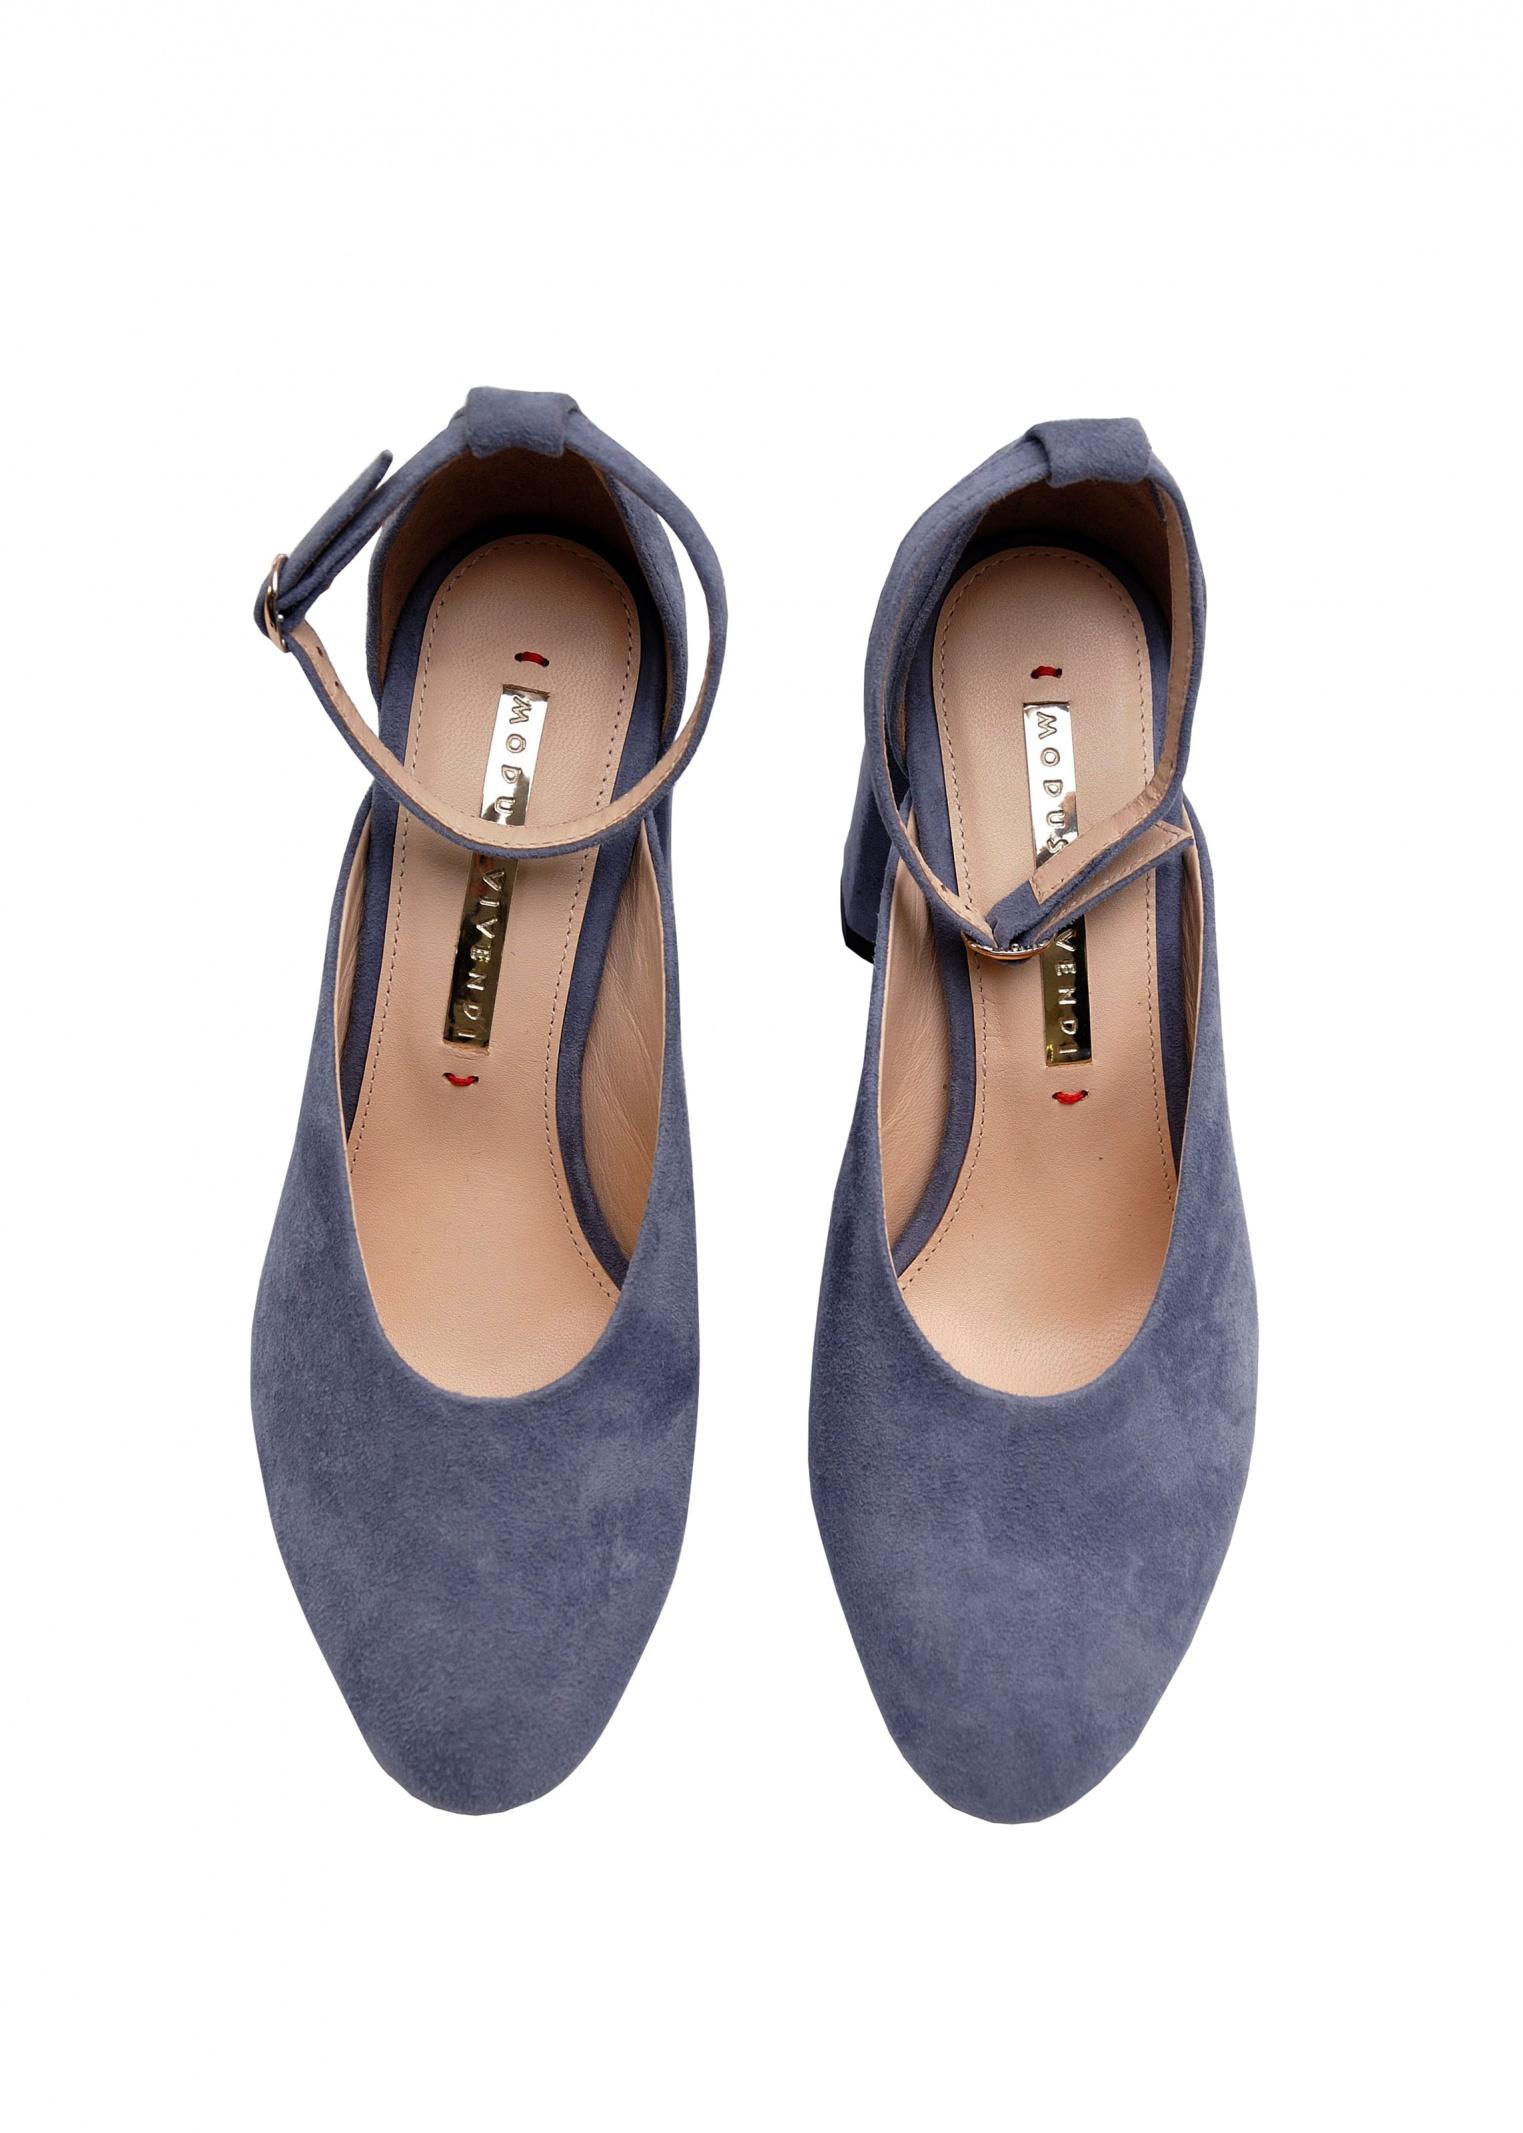 Туфлі  для жінок 894004 Замшевые голубые туфли Modus Vivendi 894004 замовити, 2017